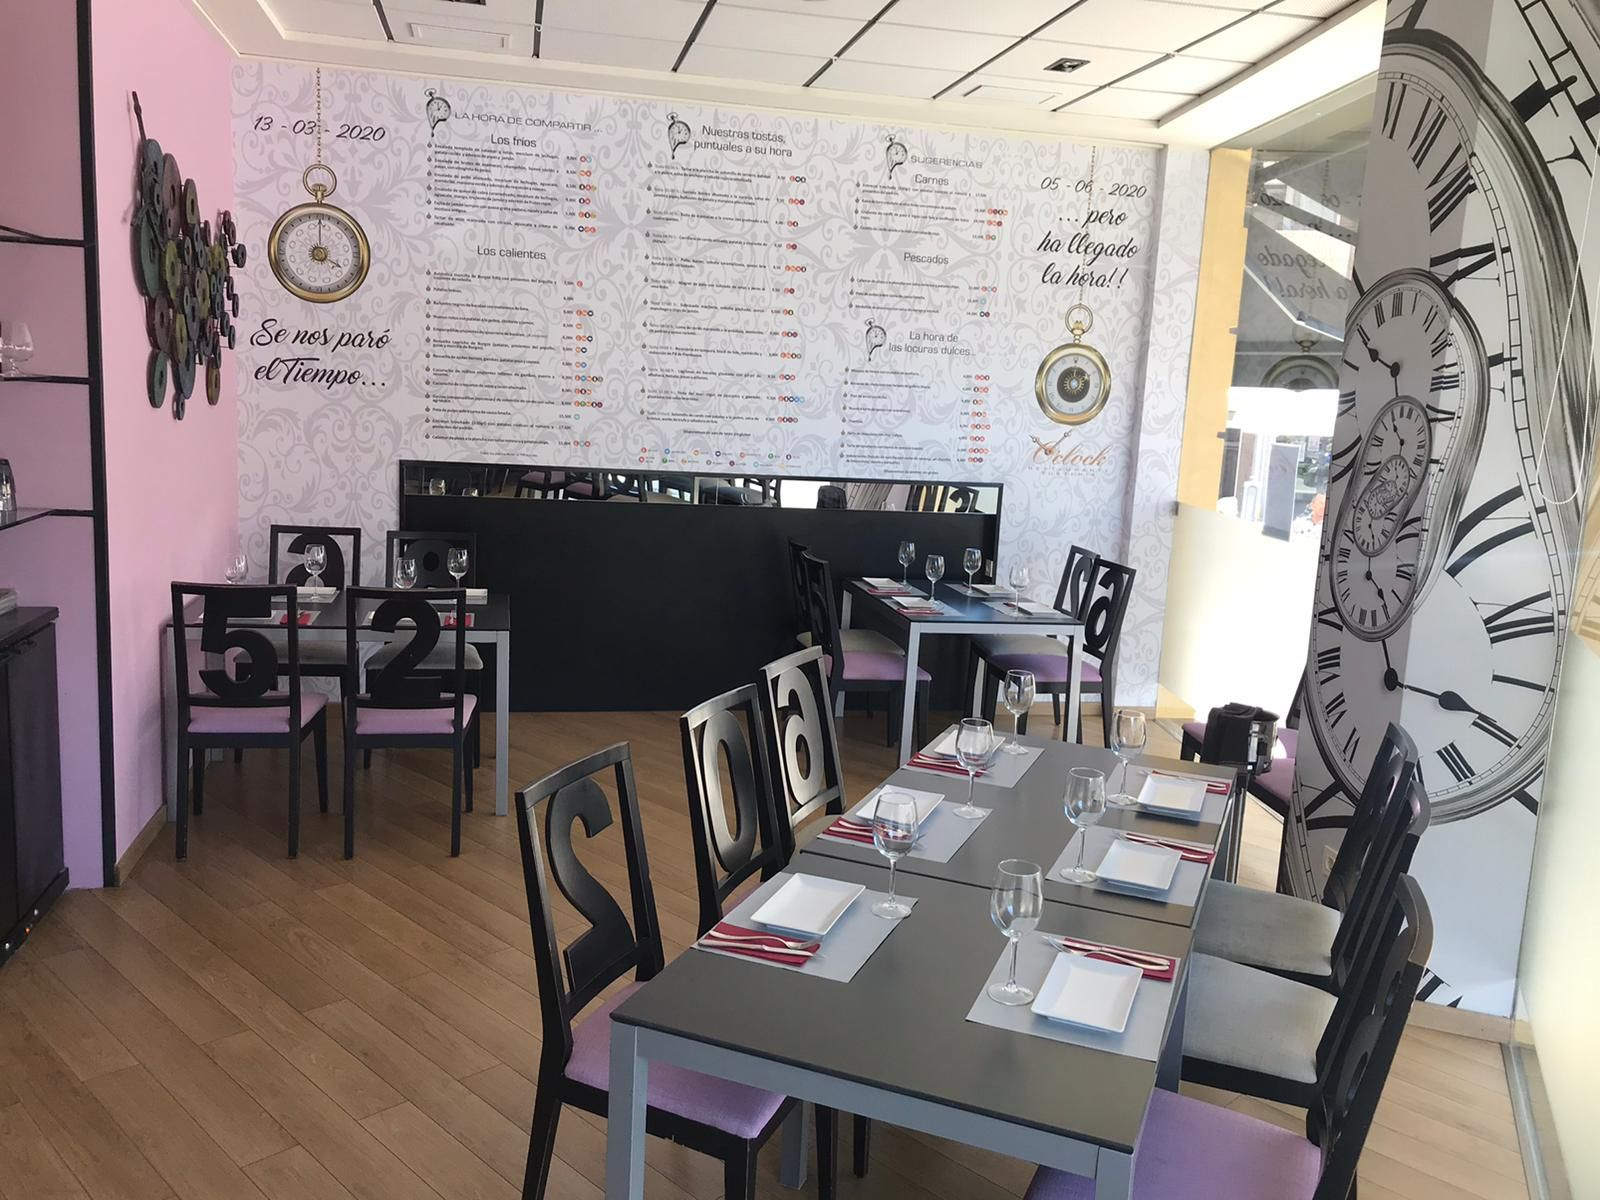 Foto 2 de Restaurante en Valencia | Cafetería Tosteria O´Clock